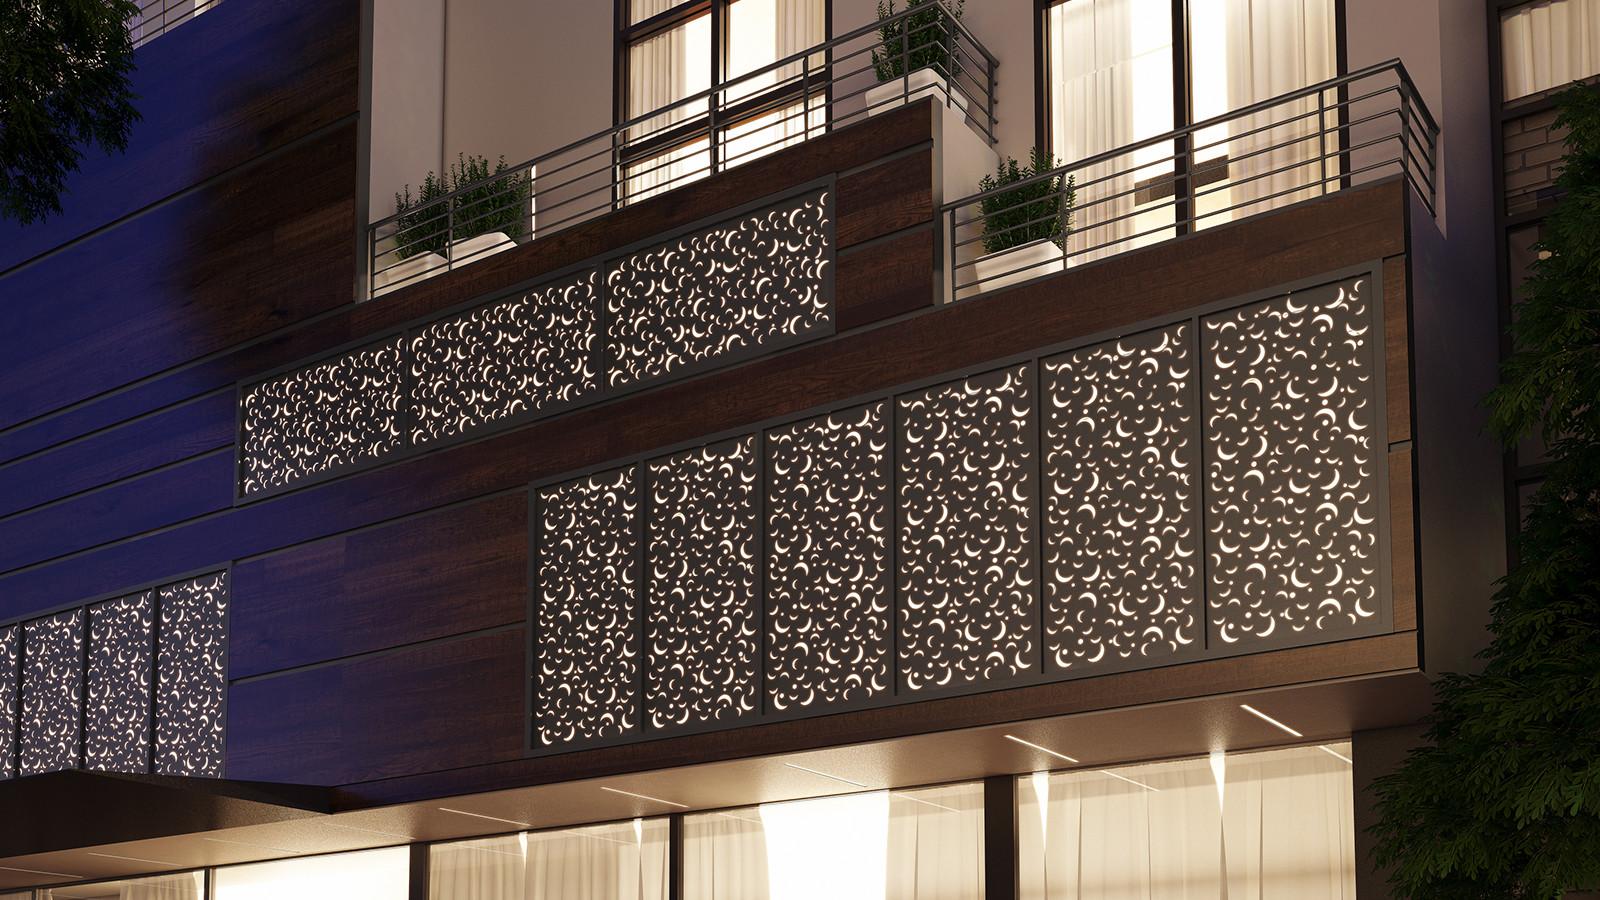 Laser Cut Wall Designs : Laser cut metal sheets moz designs decorative